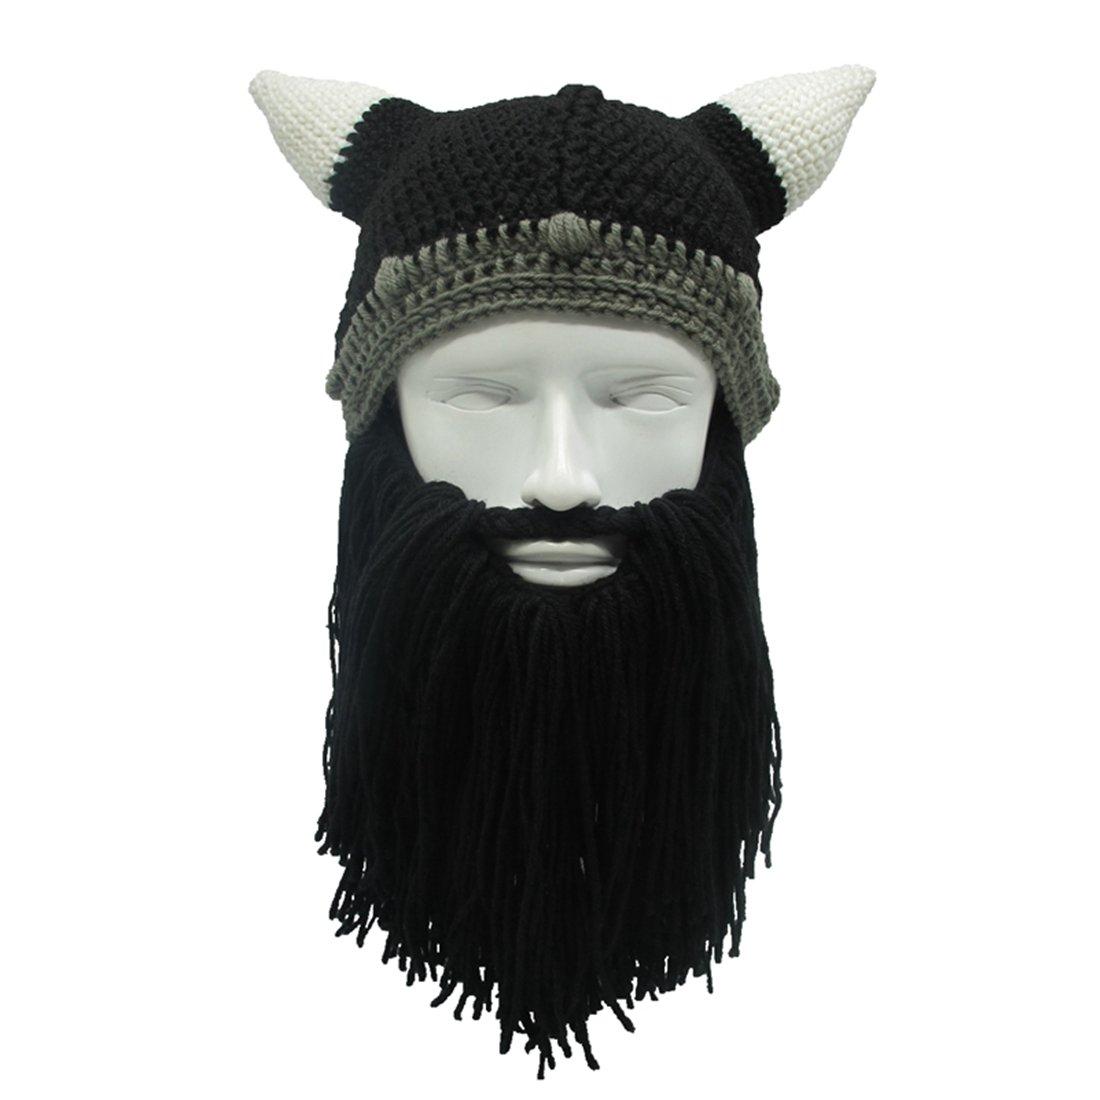 f9516acf100 Get Quotations · ZGZY Beard Hat Beanie Hat Knit Hat The Original Barbarian  Warrior Knit Beard Hat Halloween Viking